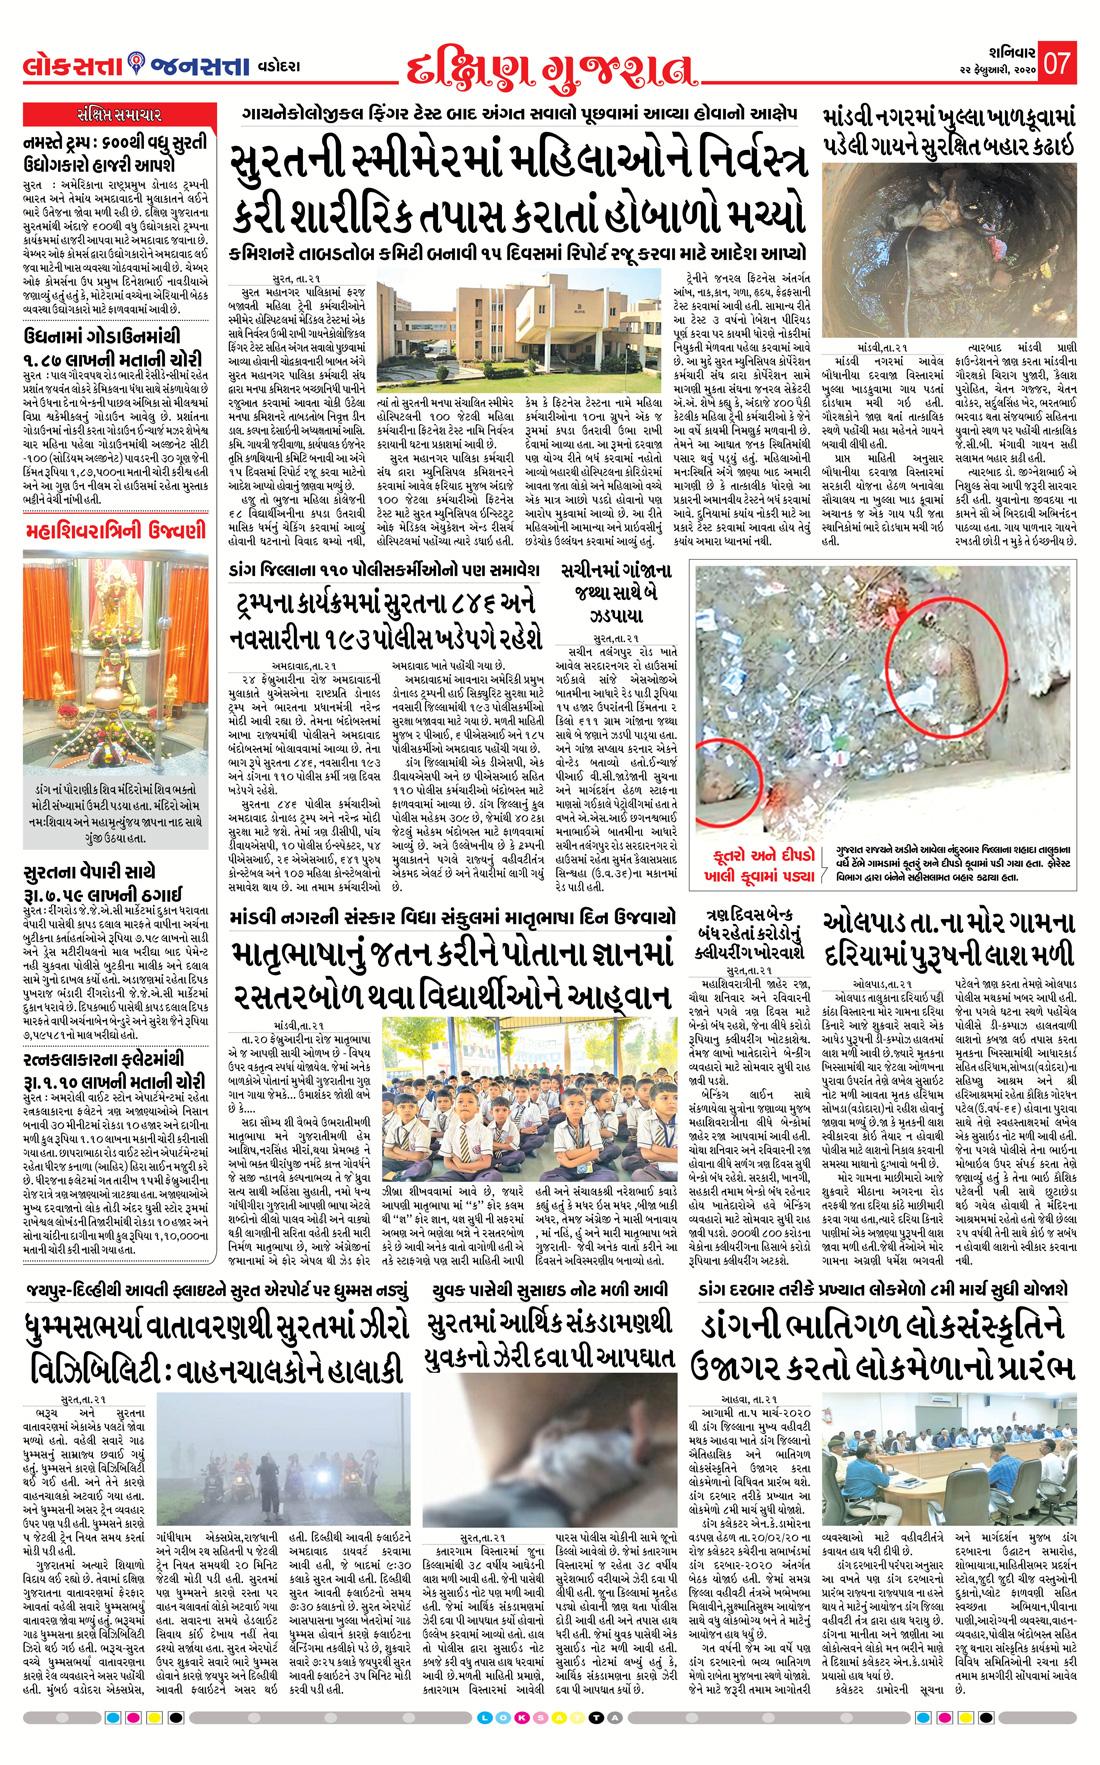 Loksatta Jansatta News Papaer E-paper dated 2020-02-22 | Page 7